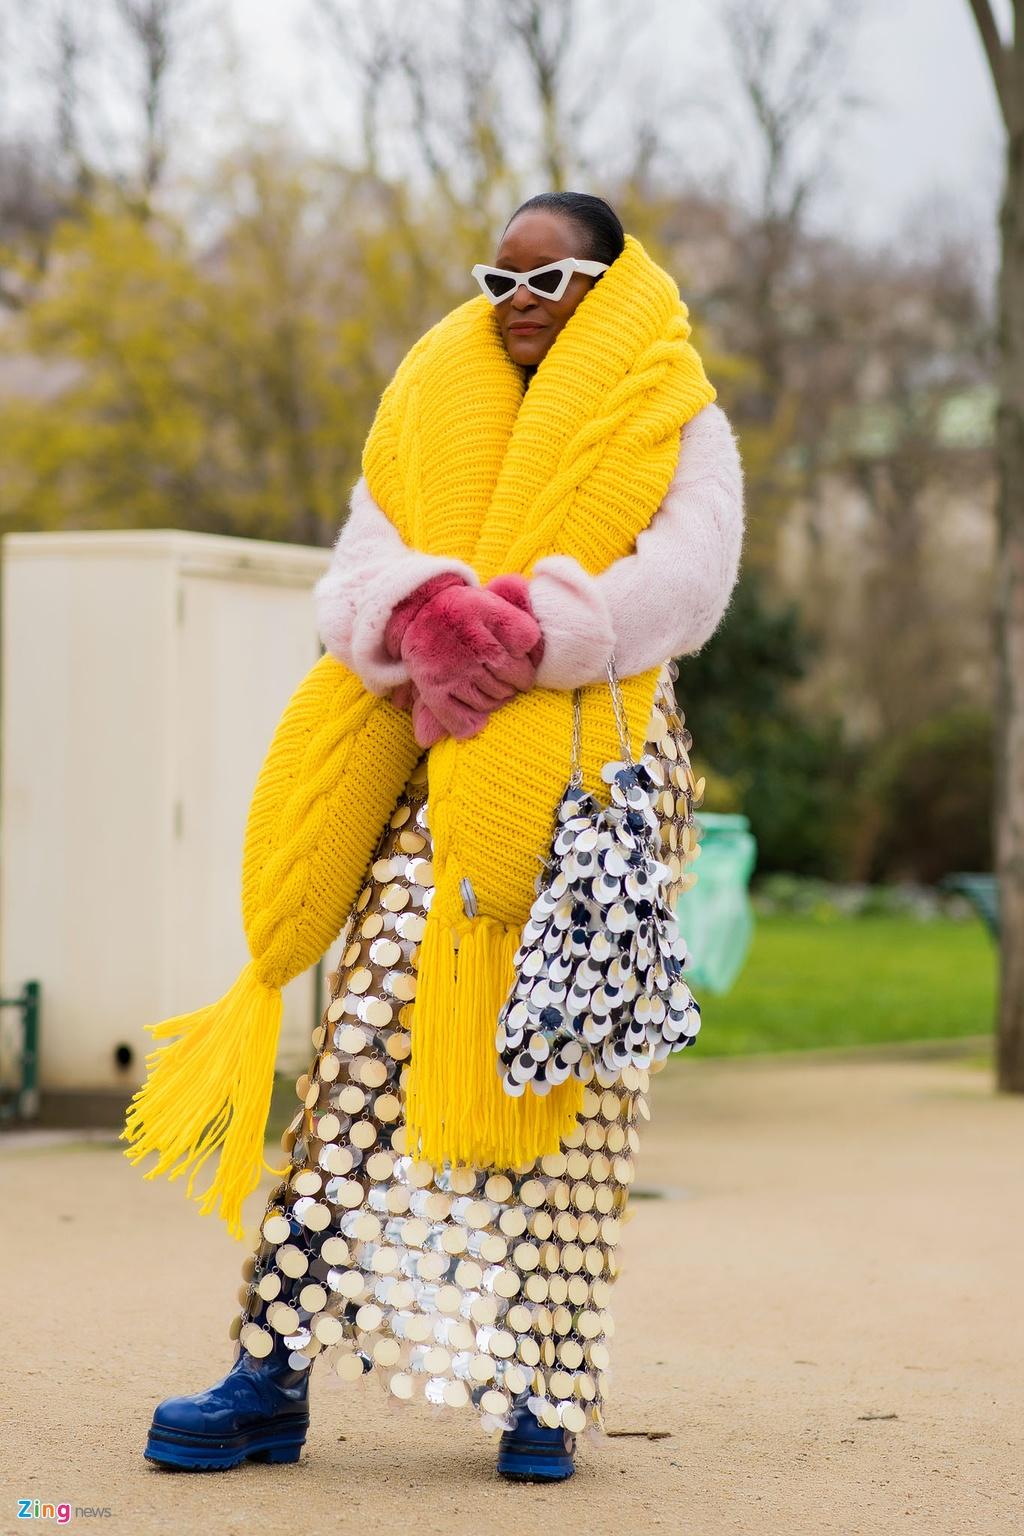 Khong khi nhon nhip truoc them show Chanel cuoi cua Karl Lagerfeld hinh anh 9